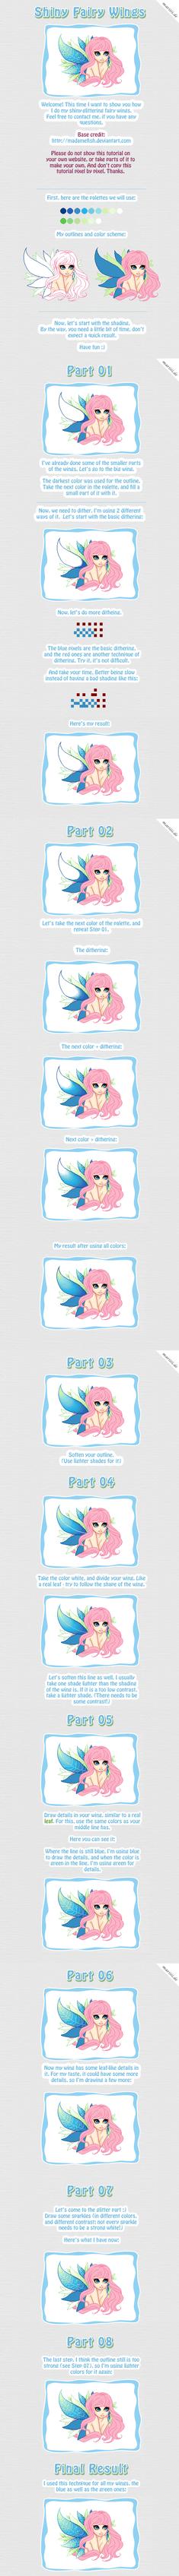 Shiny faery wings -  TUTORIAL by mariiiis-dolls